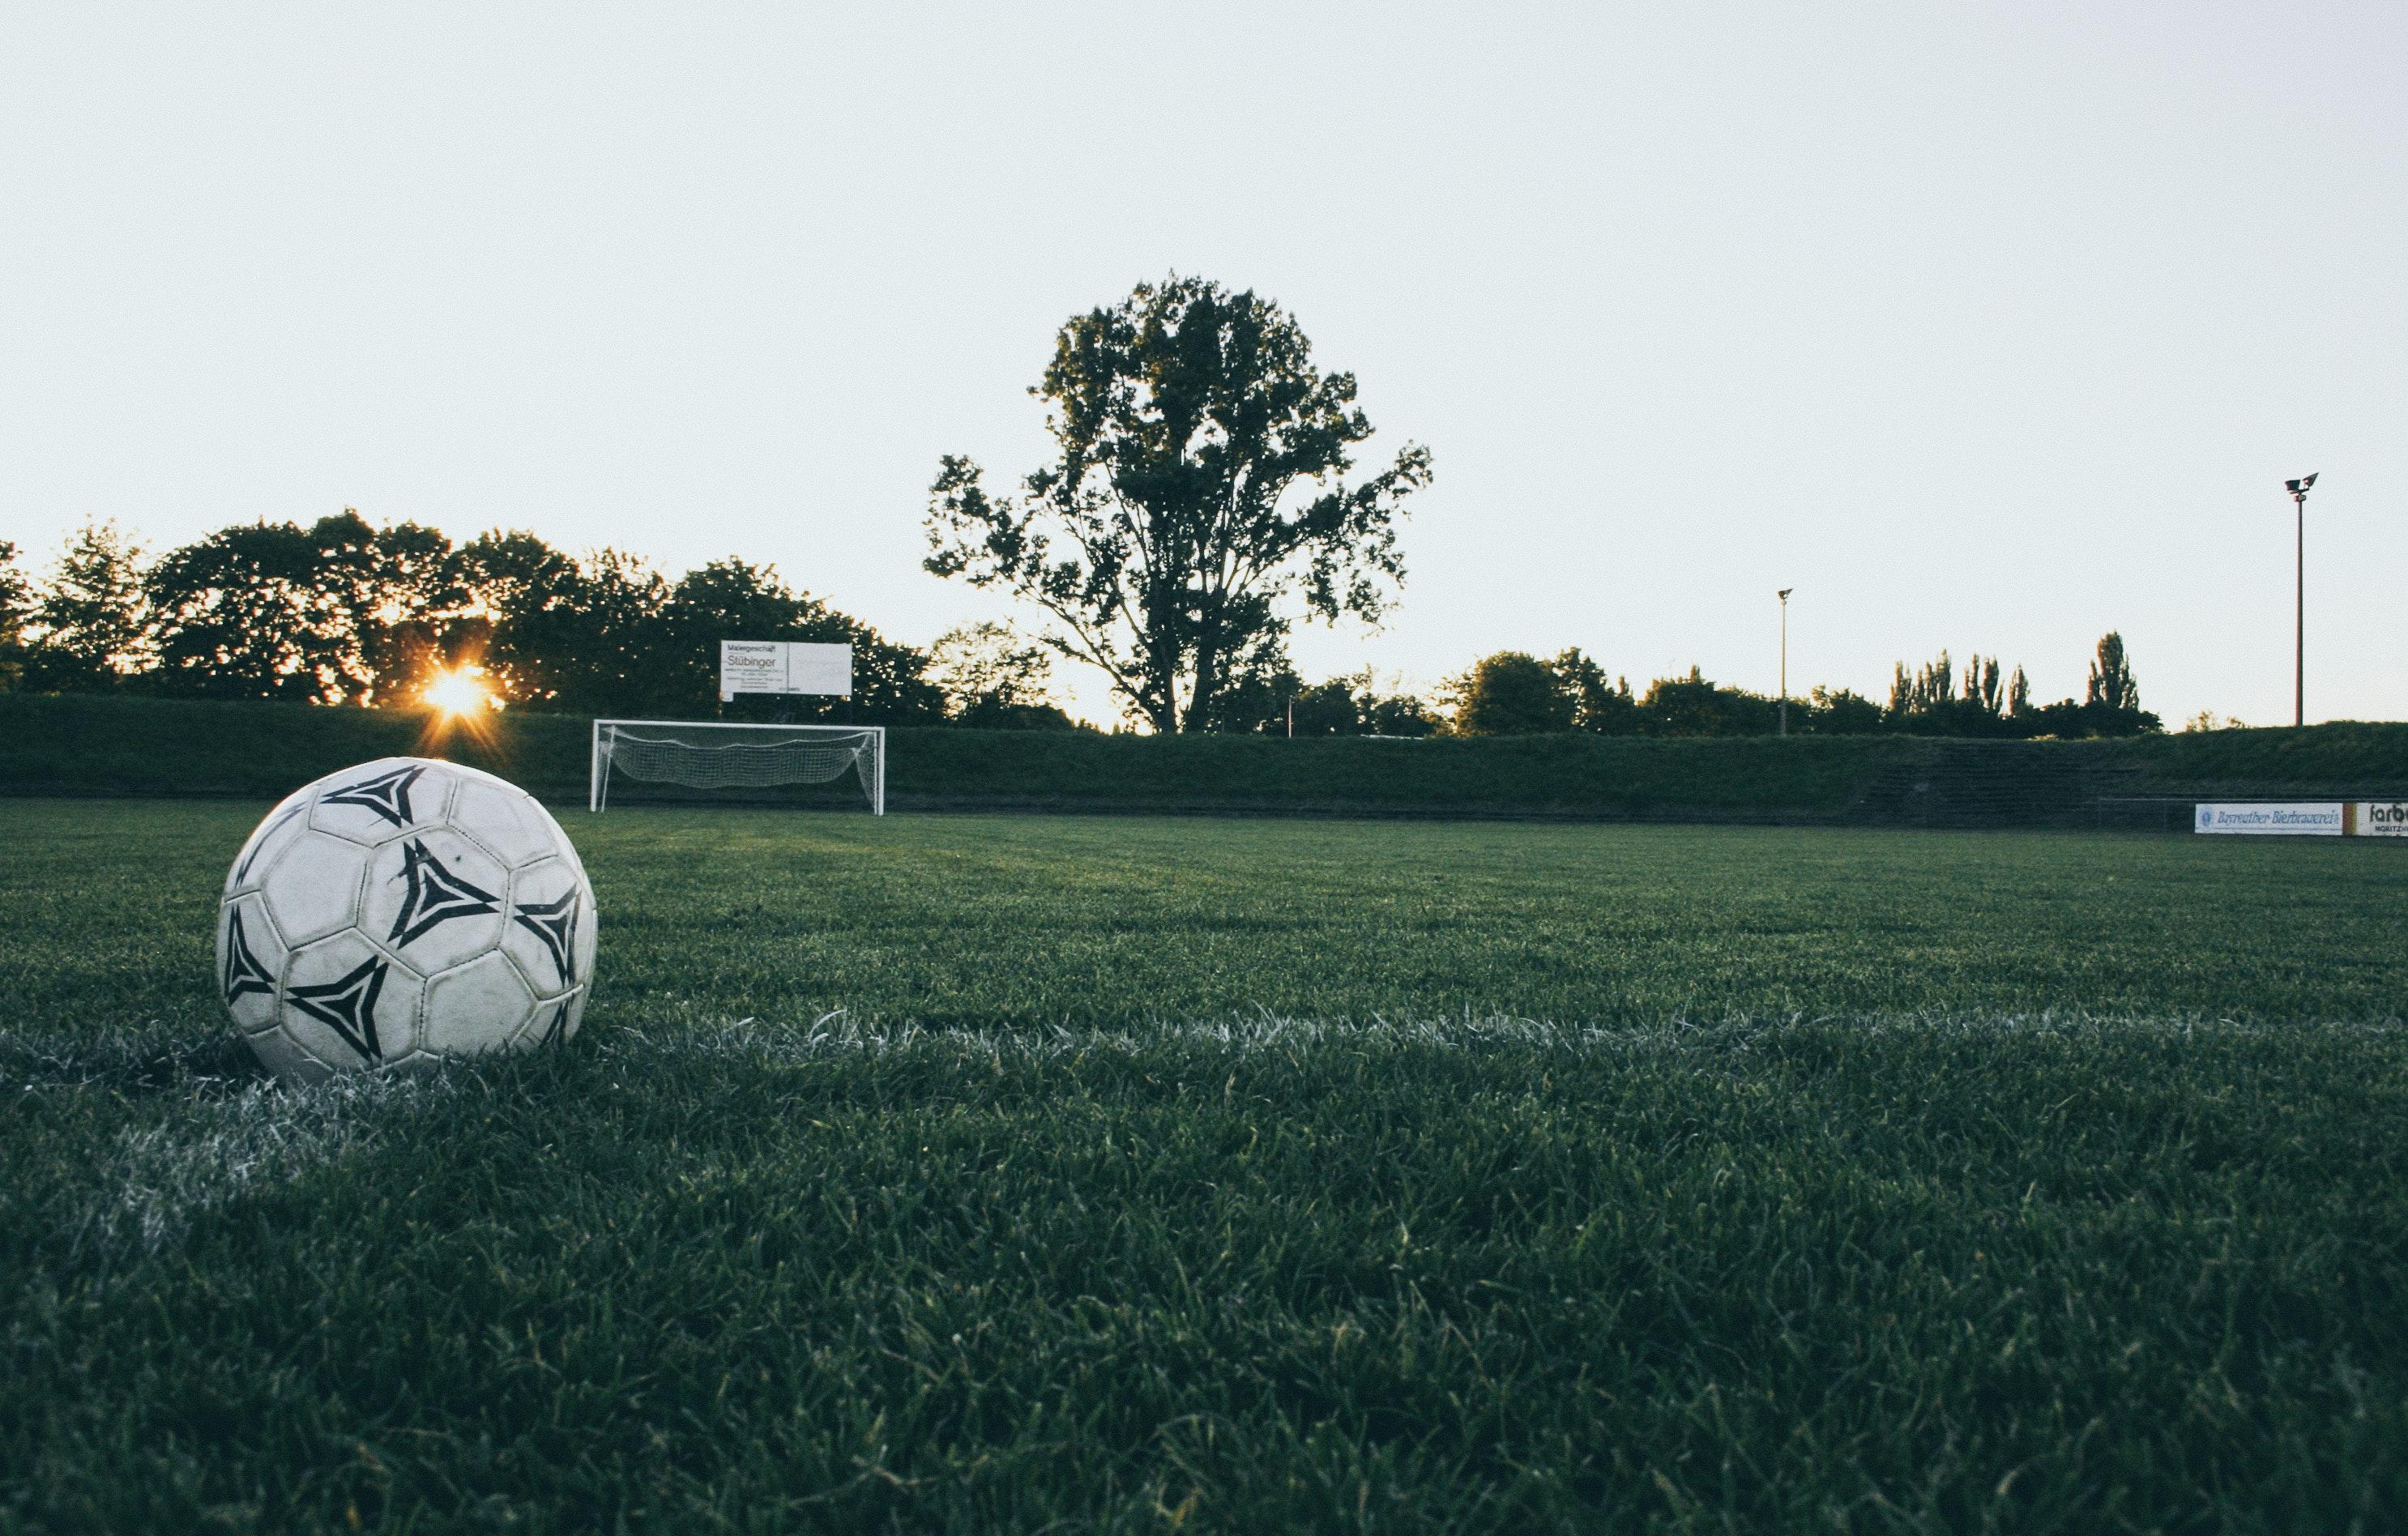 2b2b3ecf6 Black and White Soccer Ball on Green Grass Land during Daytime ...